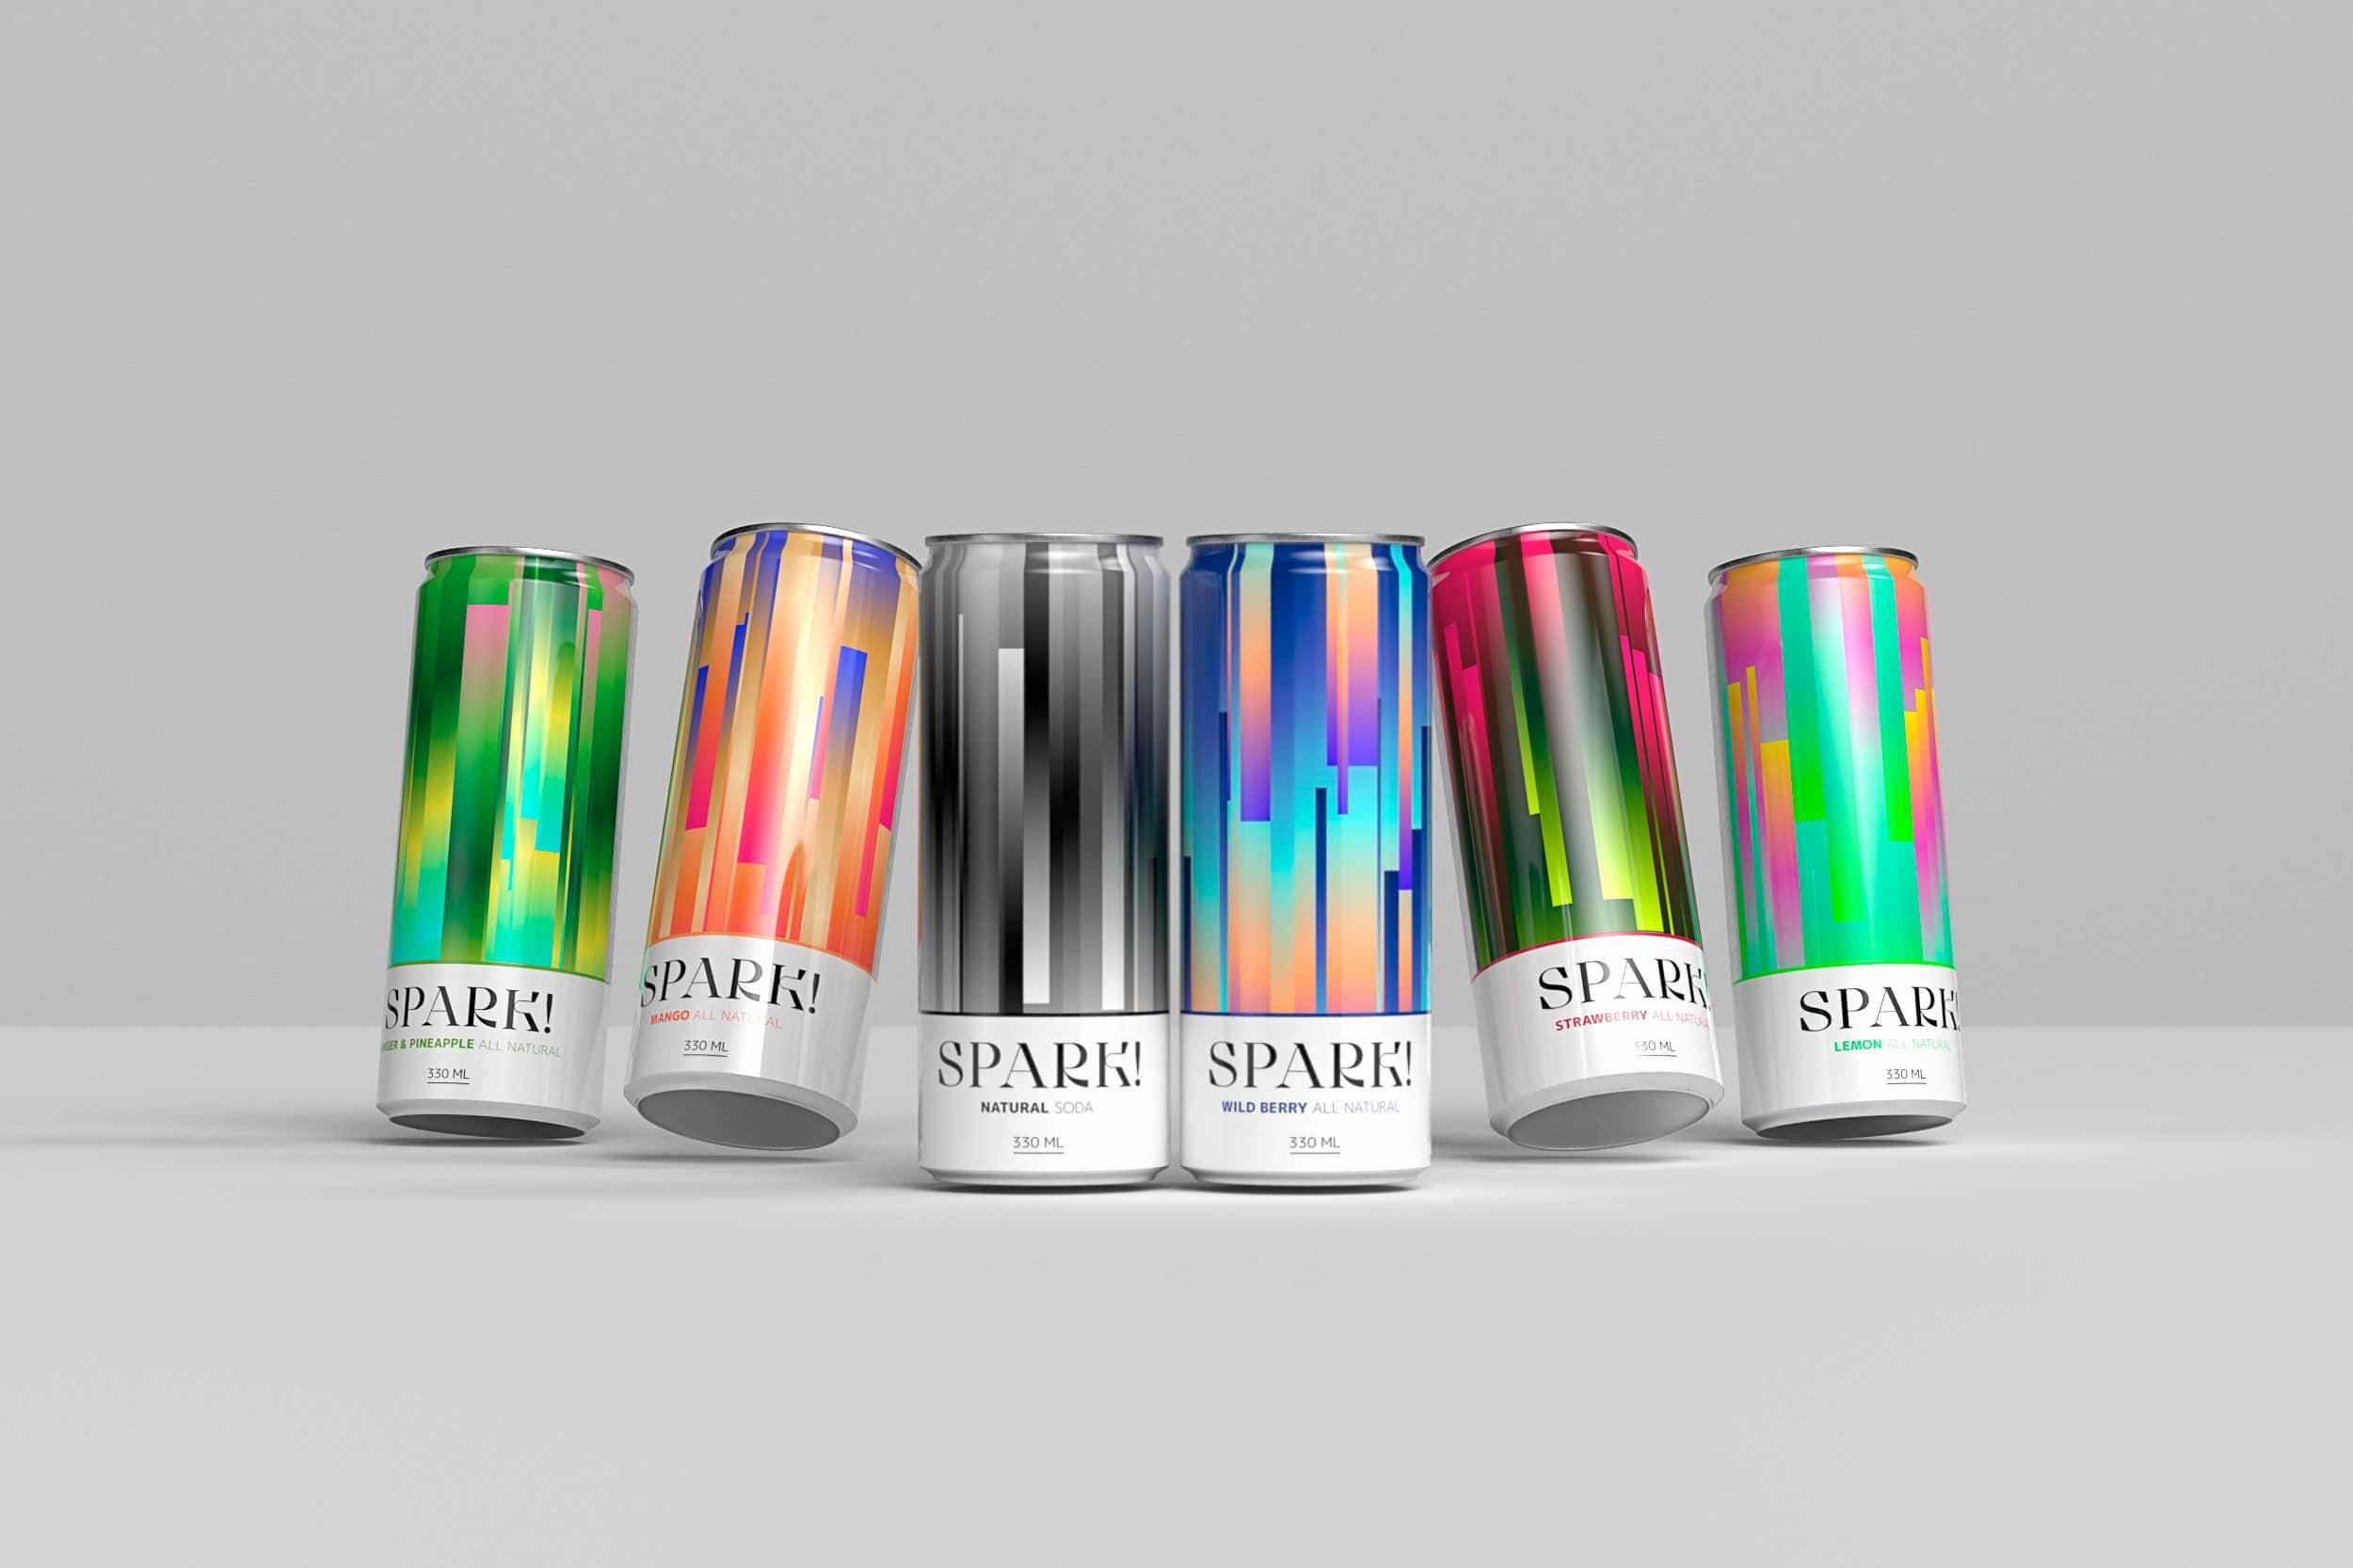 Spark range! 6 cans, 6 flavors!